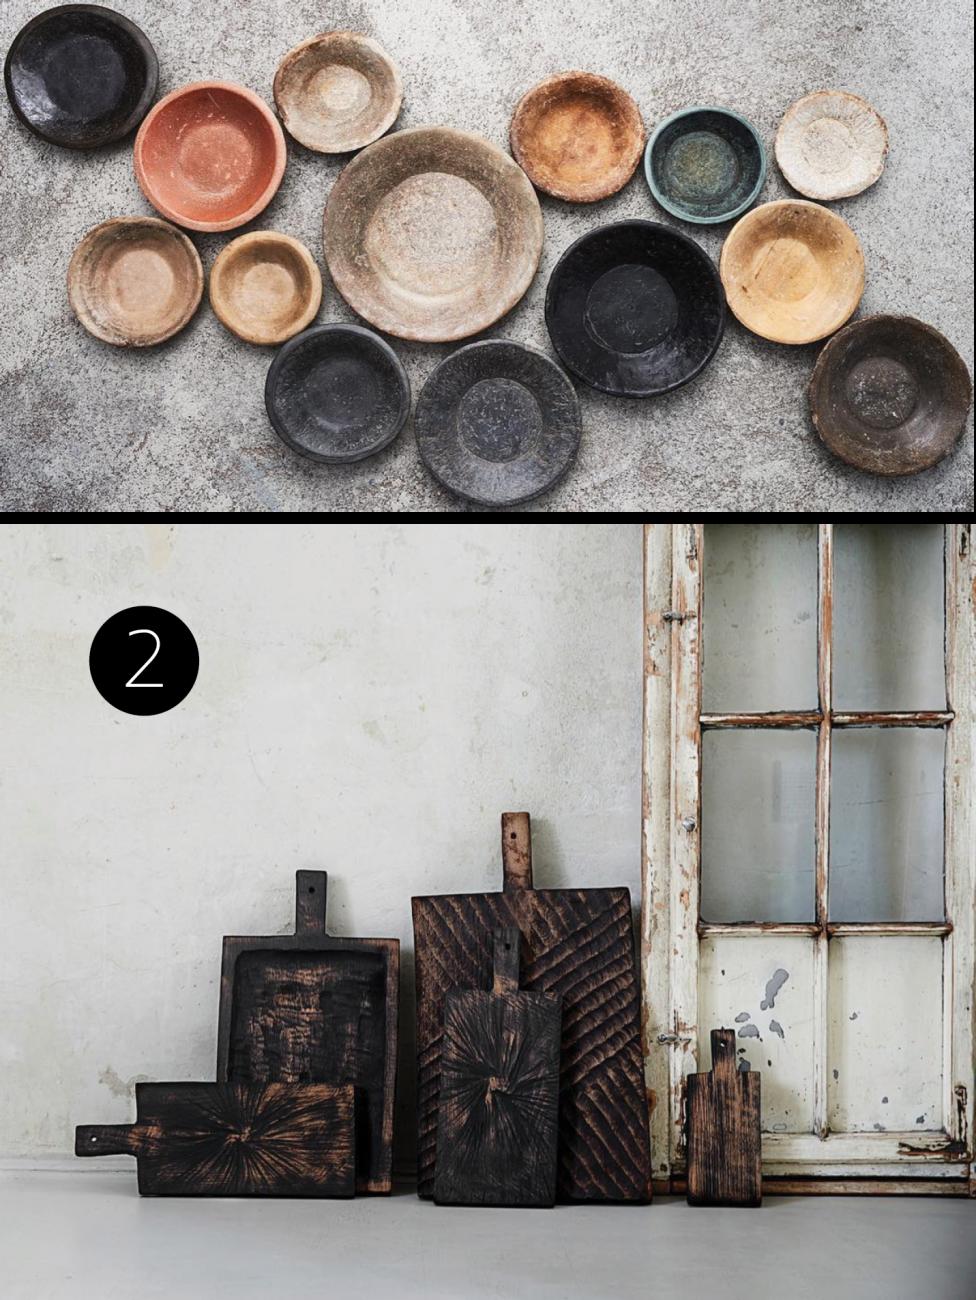 corotos_market-stone-plates-wooden boards